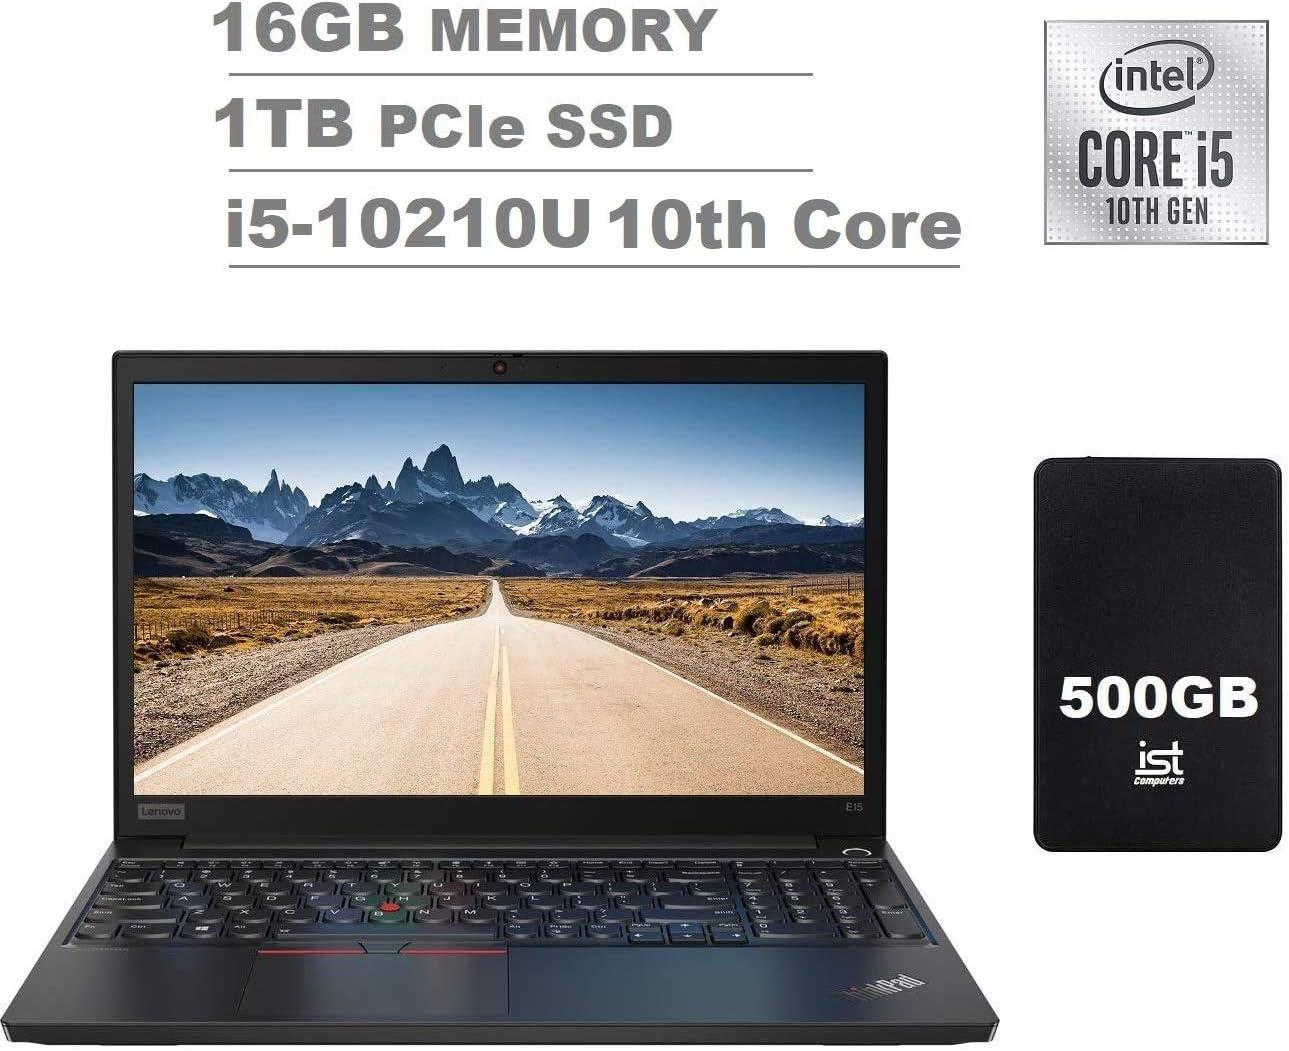 "2020 Lenovo ThinkPad E15 15.6"" FHD Full HD (1920x1080) Business Laptop (Intel 10th Quad Core i5-10210U, 16GB DDR4 RAM, 1TB PCIe SSD) Type-C, HDMI, Windows 10 Pro + IST 500GB Portable HDD"